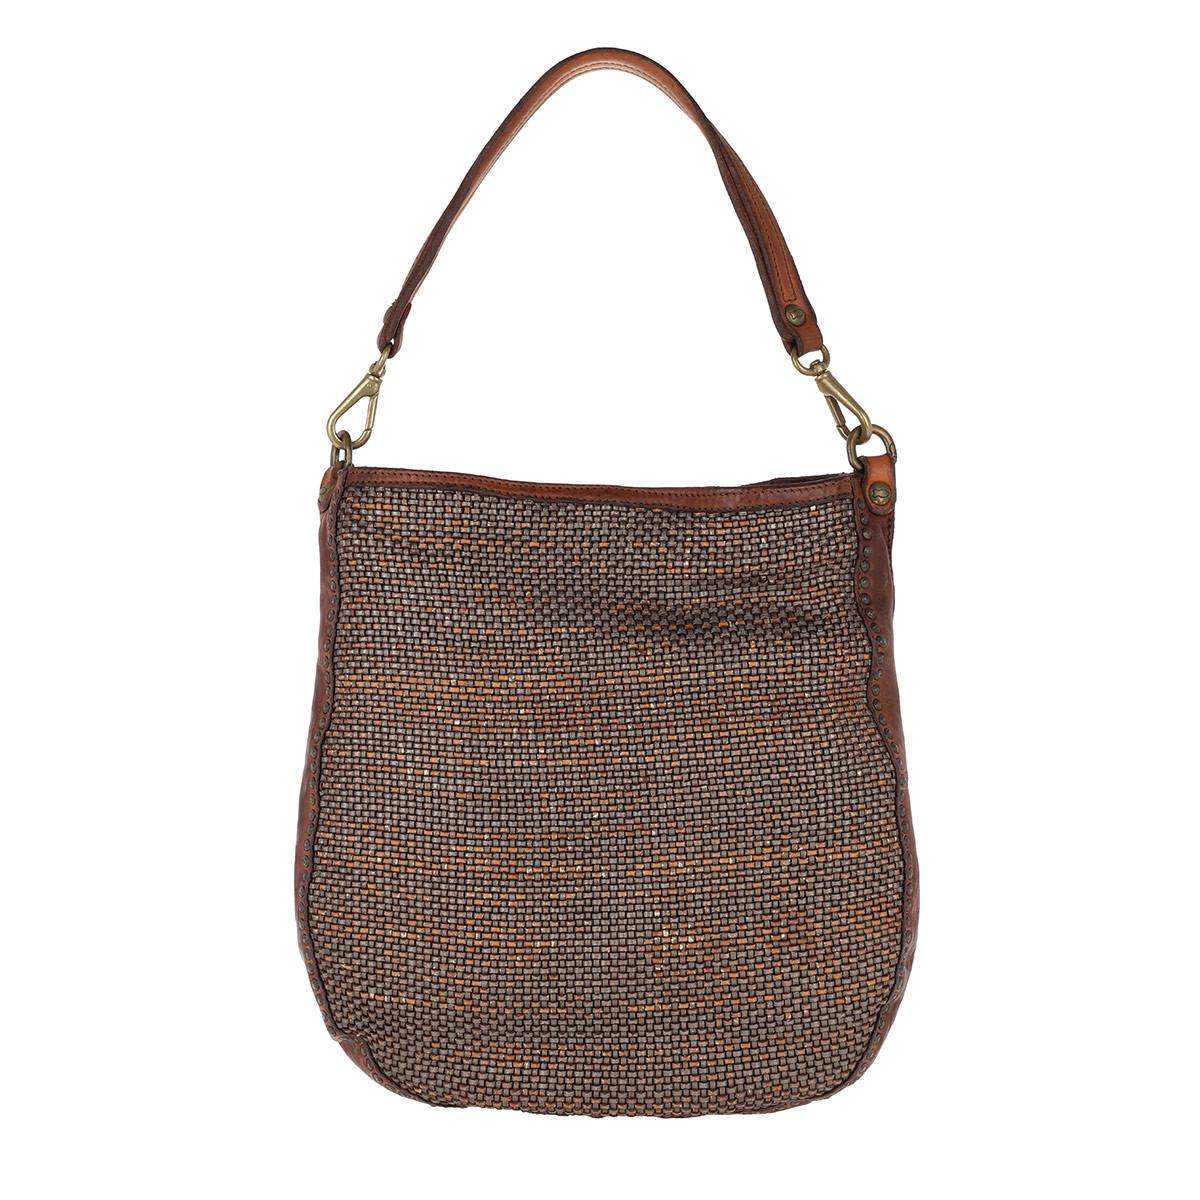 92e8570d7a7b Campomaggi Leather Hobo Bag Acciaio cognac in Brown - Lyst